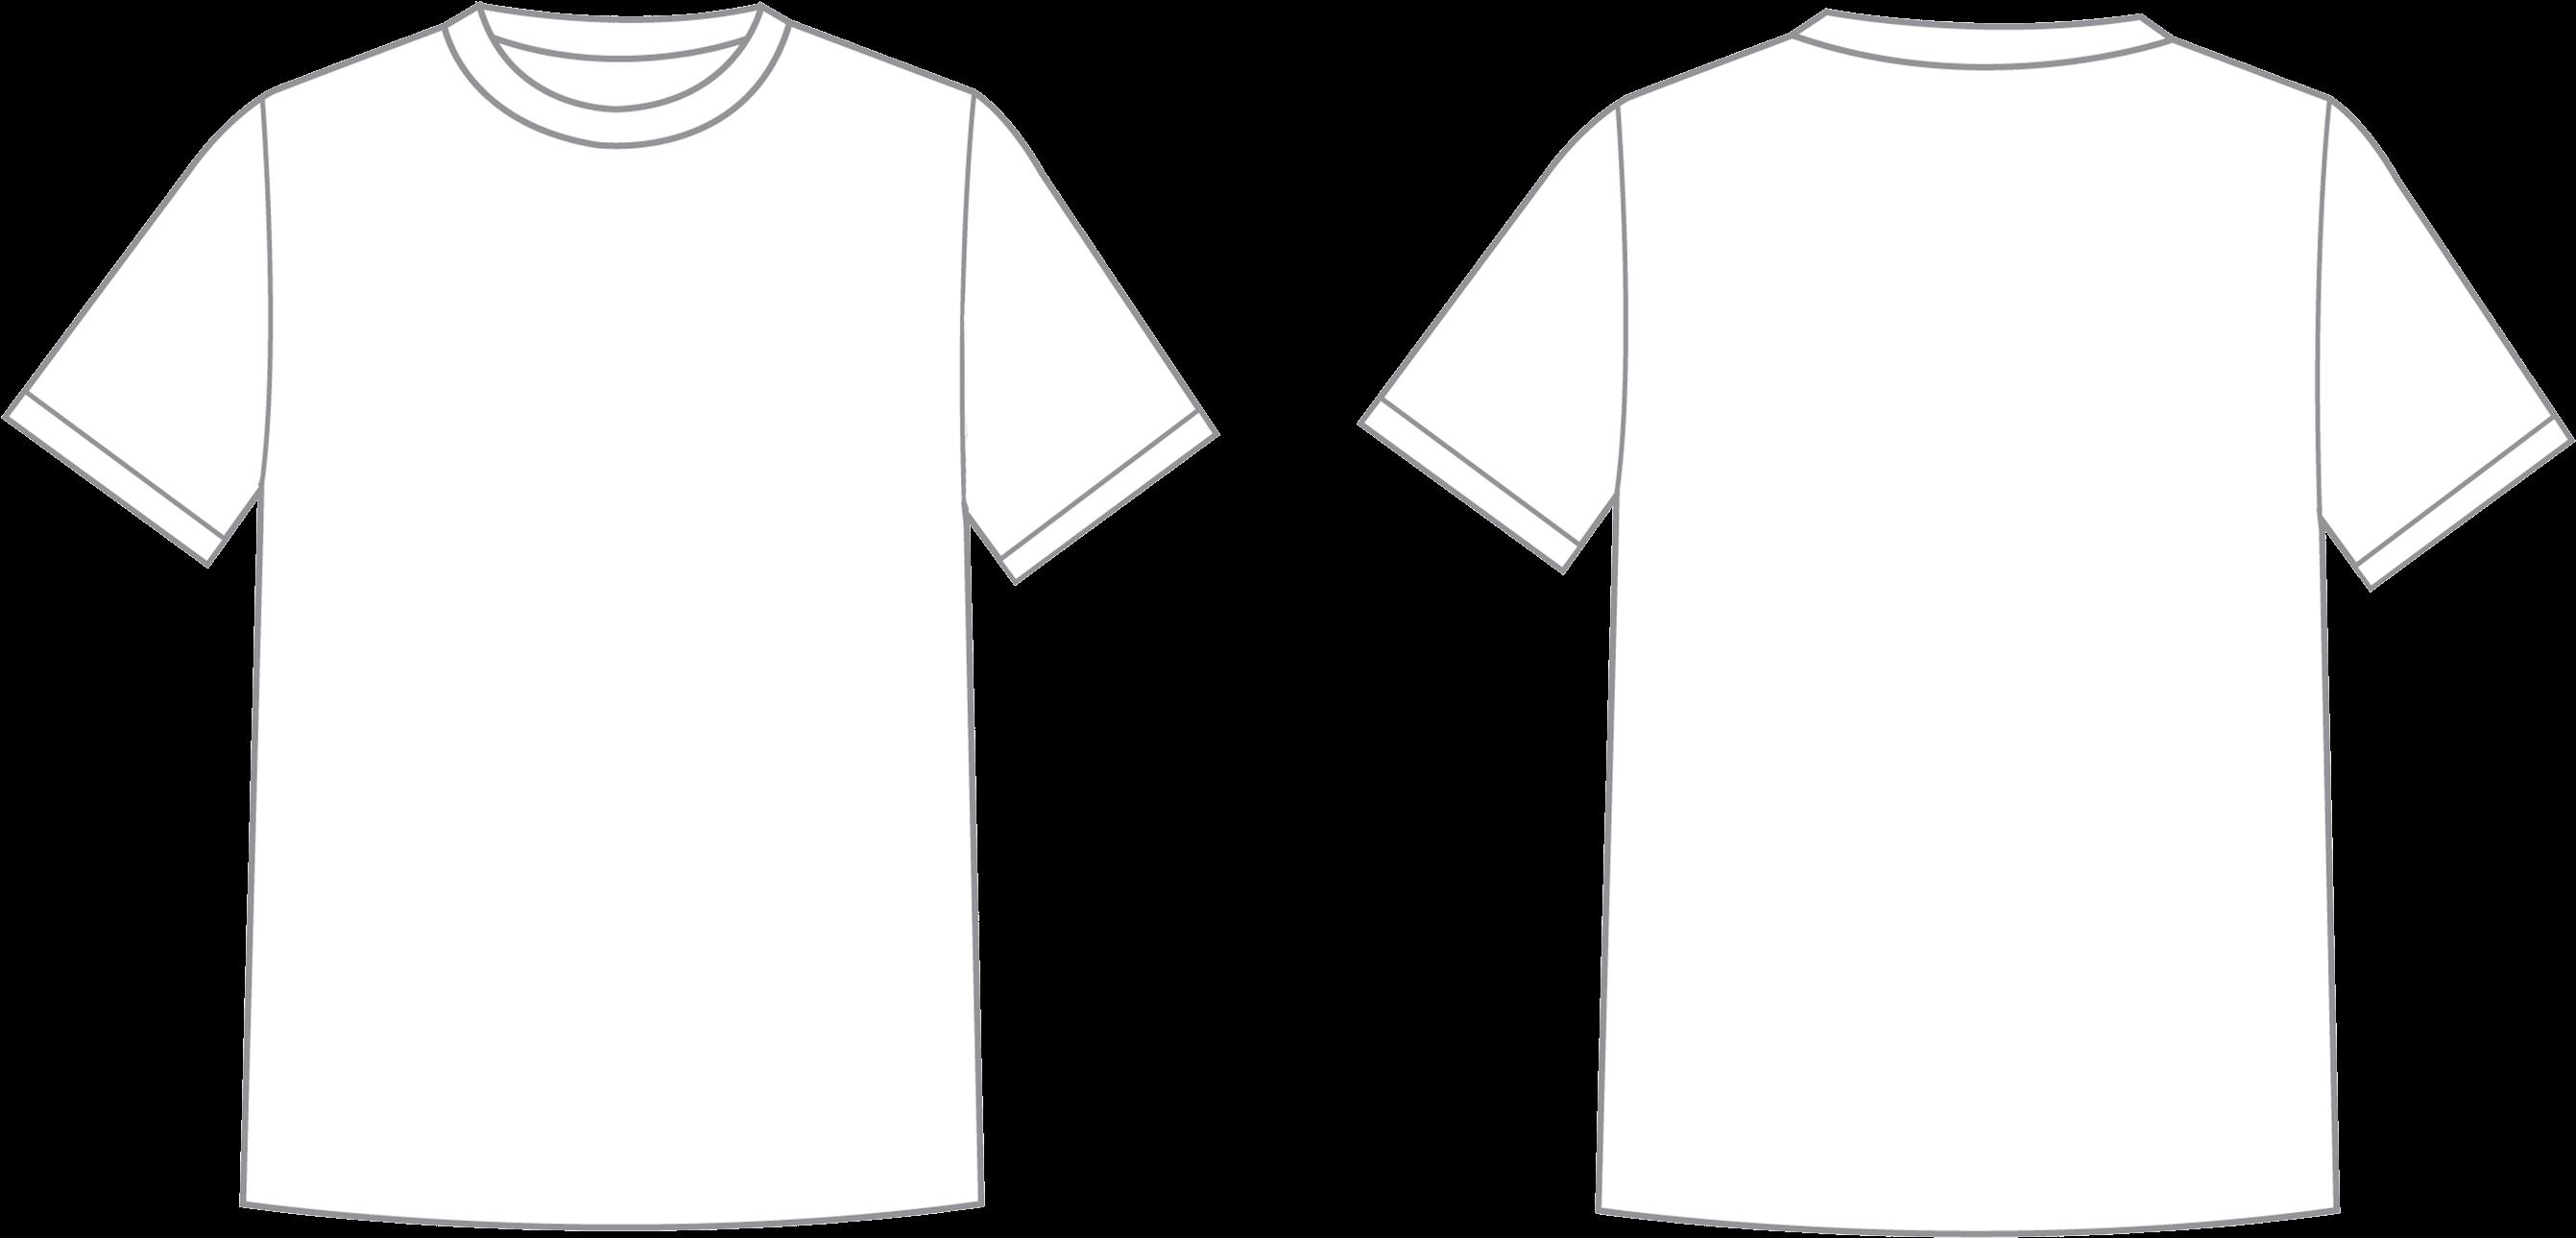 blank t shirt png - T Shirt Template Png - Transparent T ...